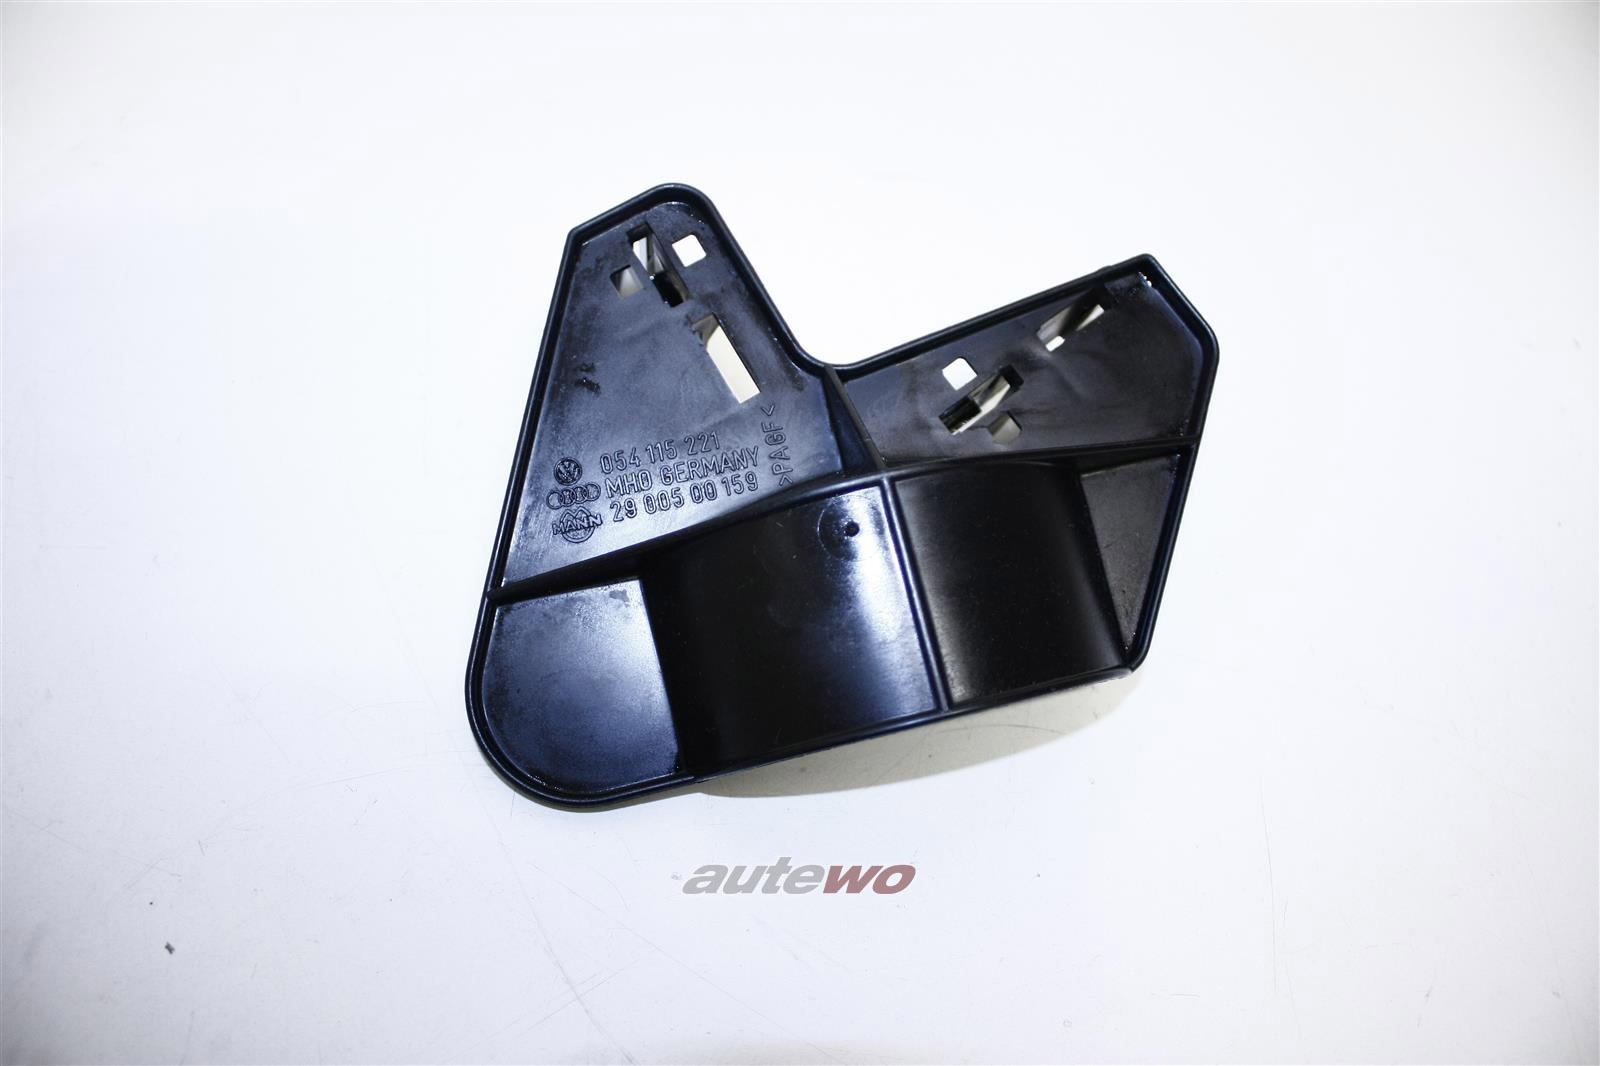 054115221 NEU Audi 80/90/100/200/Urquattro 2.0-2.3l Schwallsperre Ölwanne